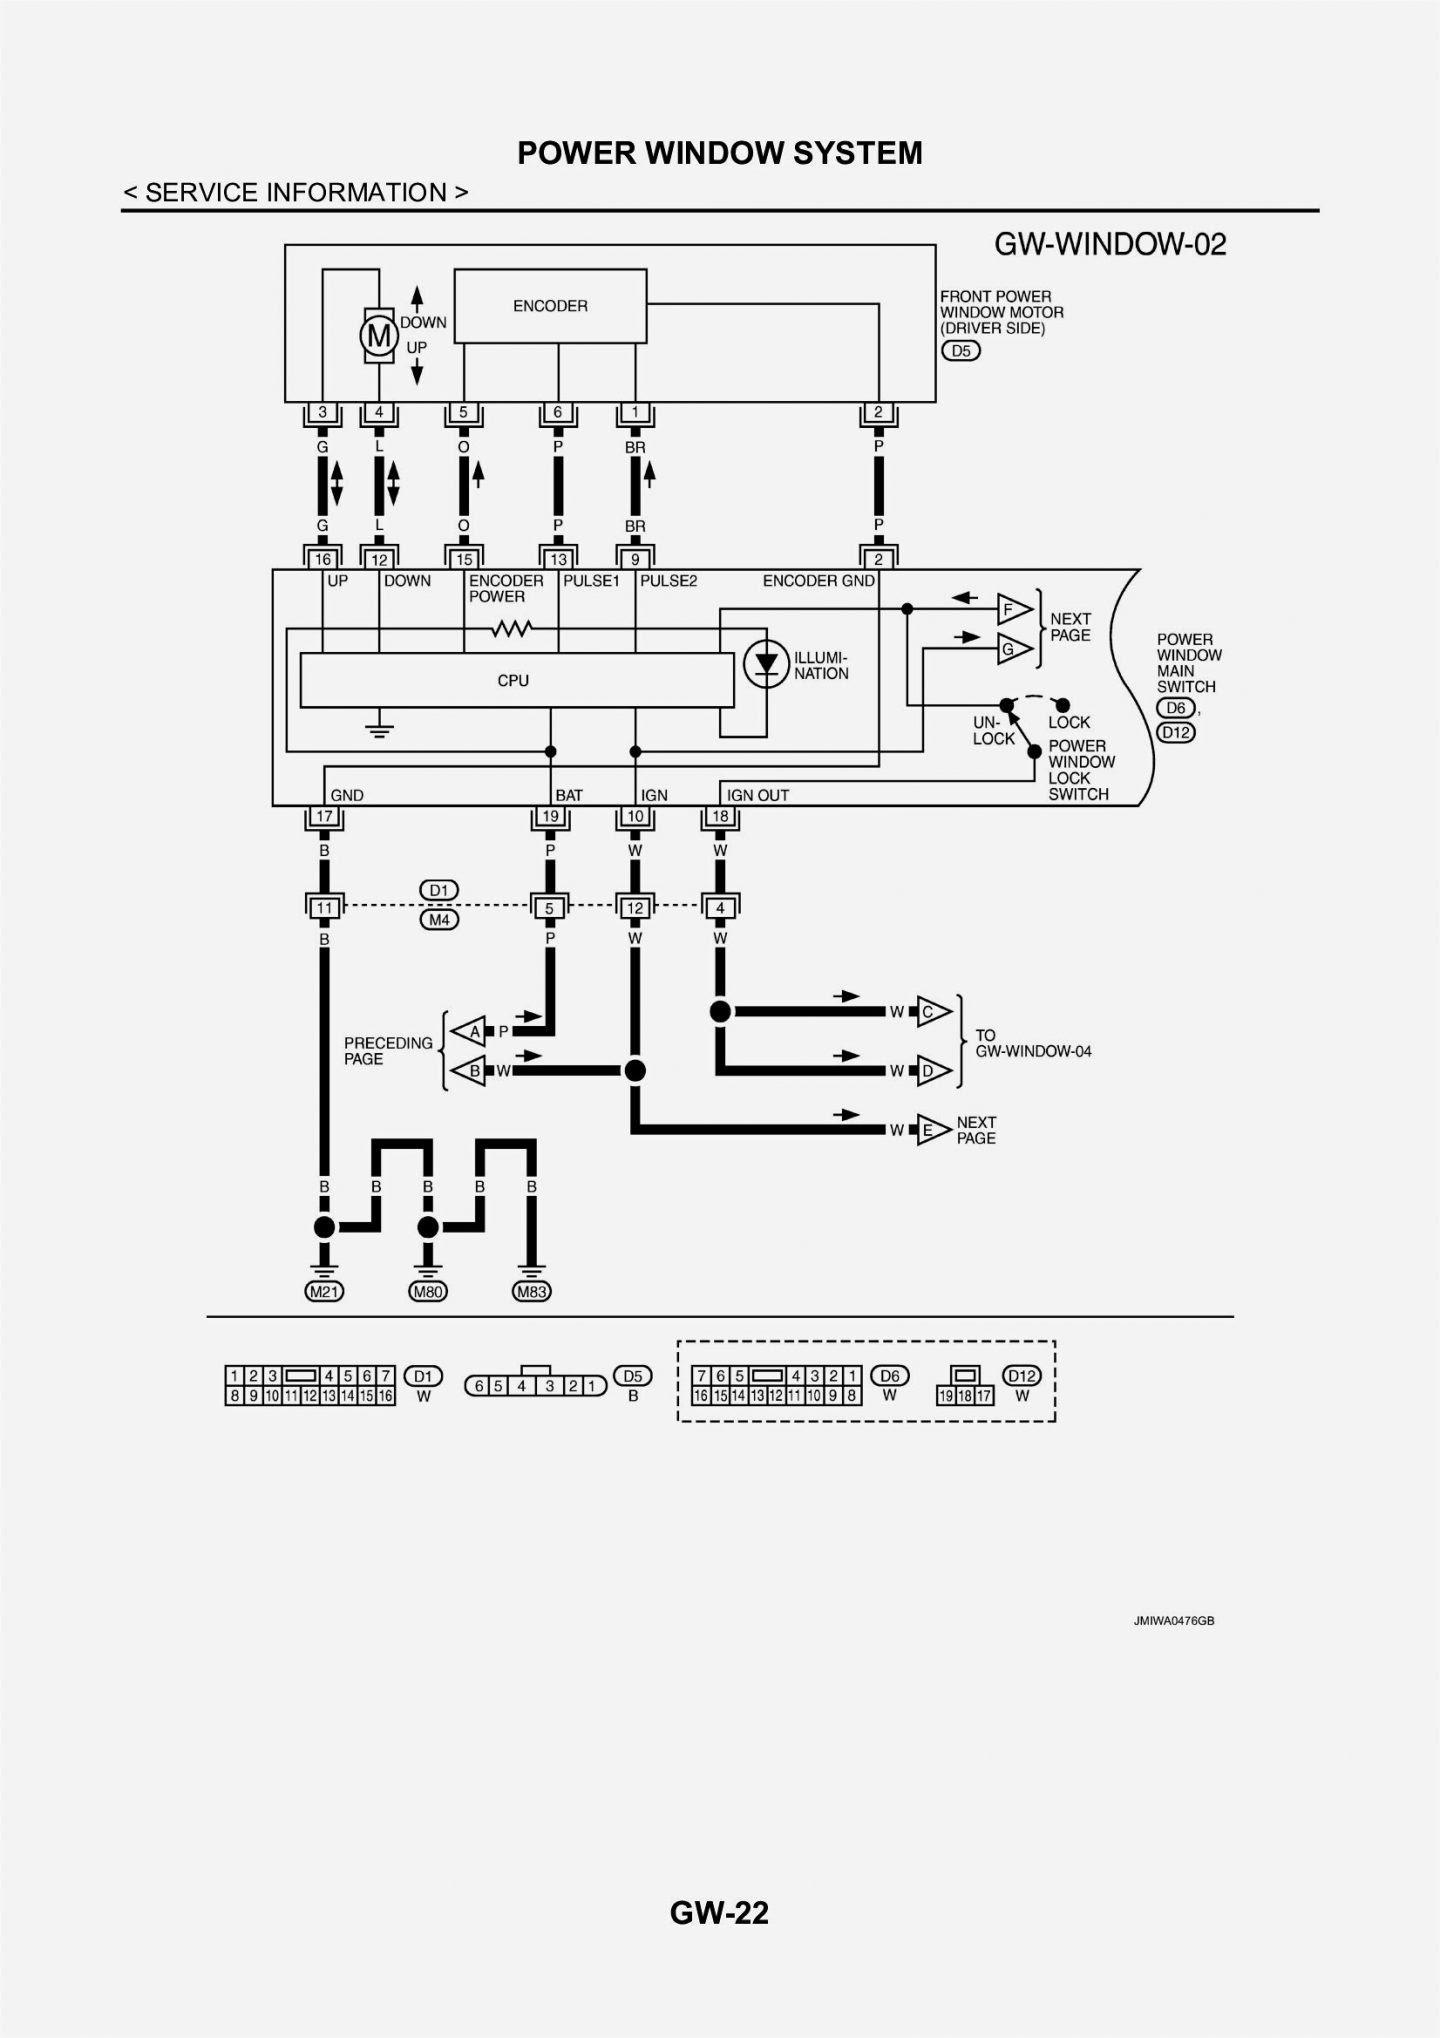 Diagram Bad Boy Buggy Ambush Wiring Diagram Full Version Hd Quality Wiring Diagram Diagramcappse Apd Audax It